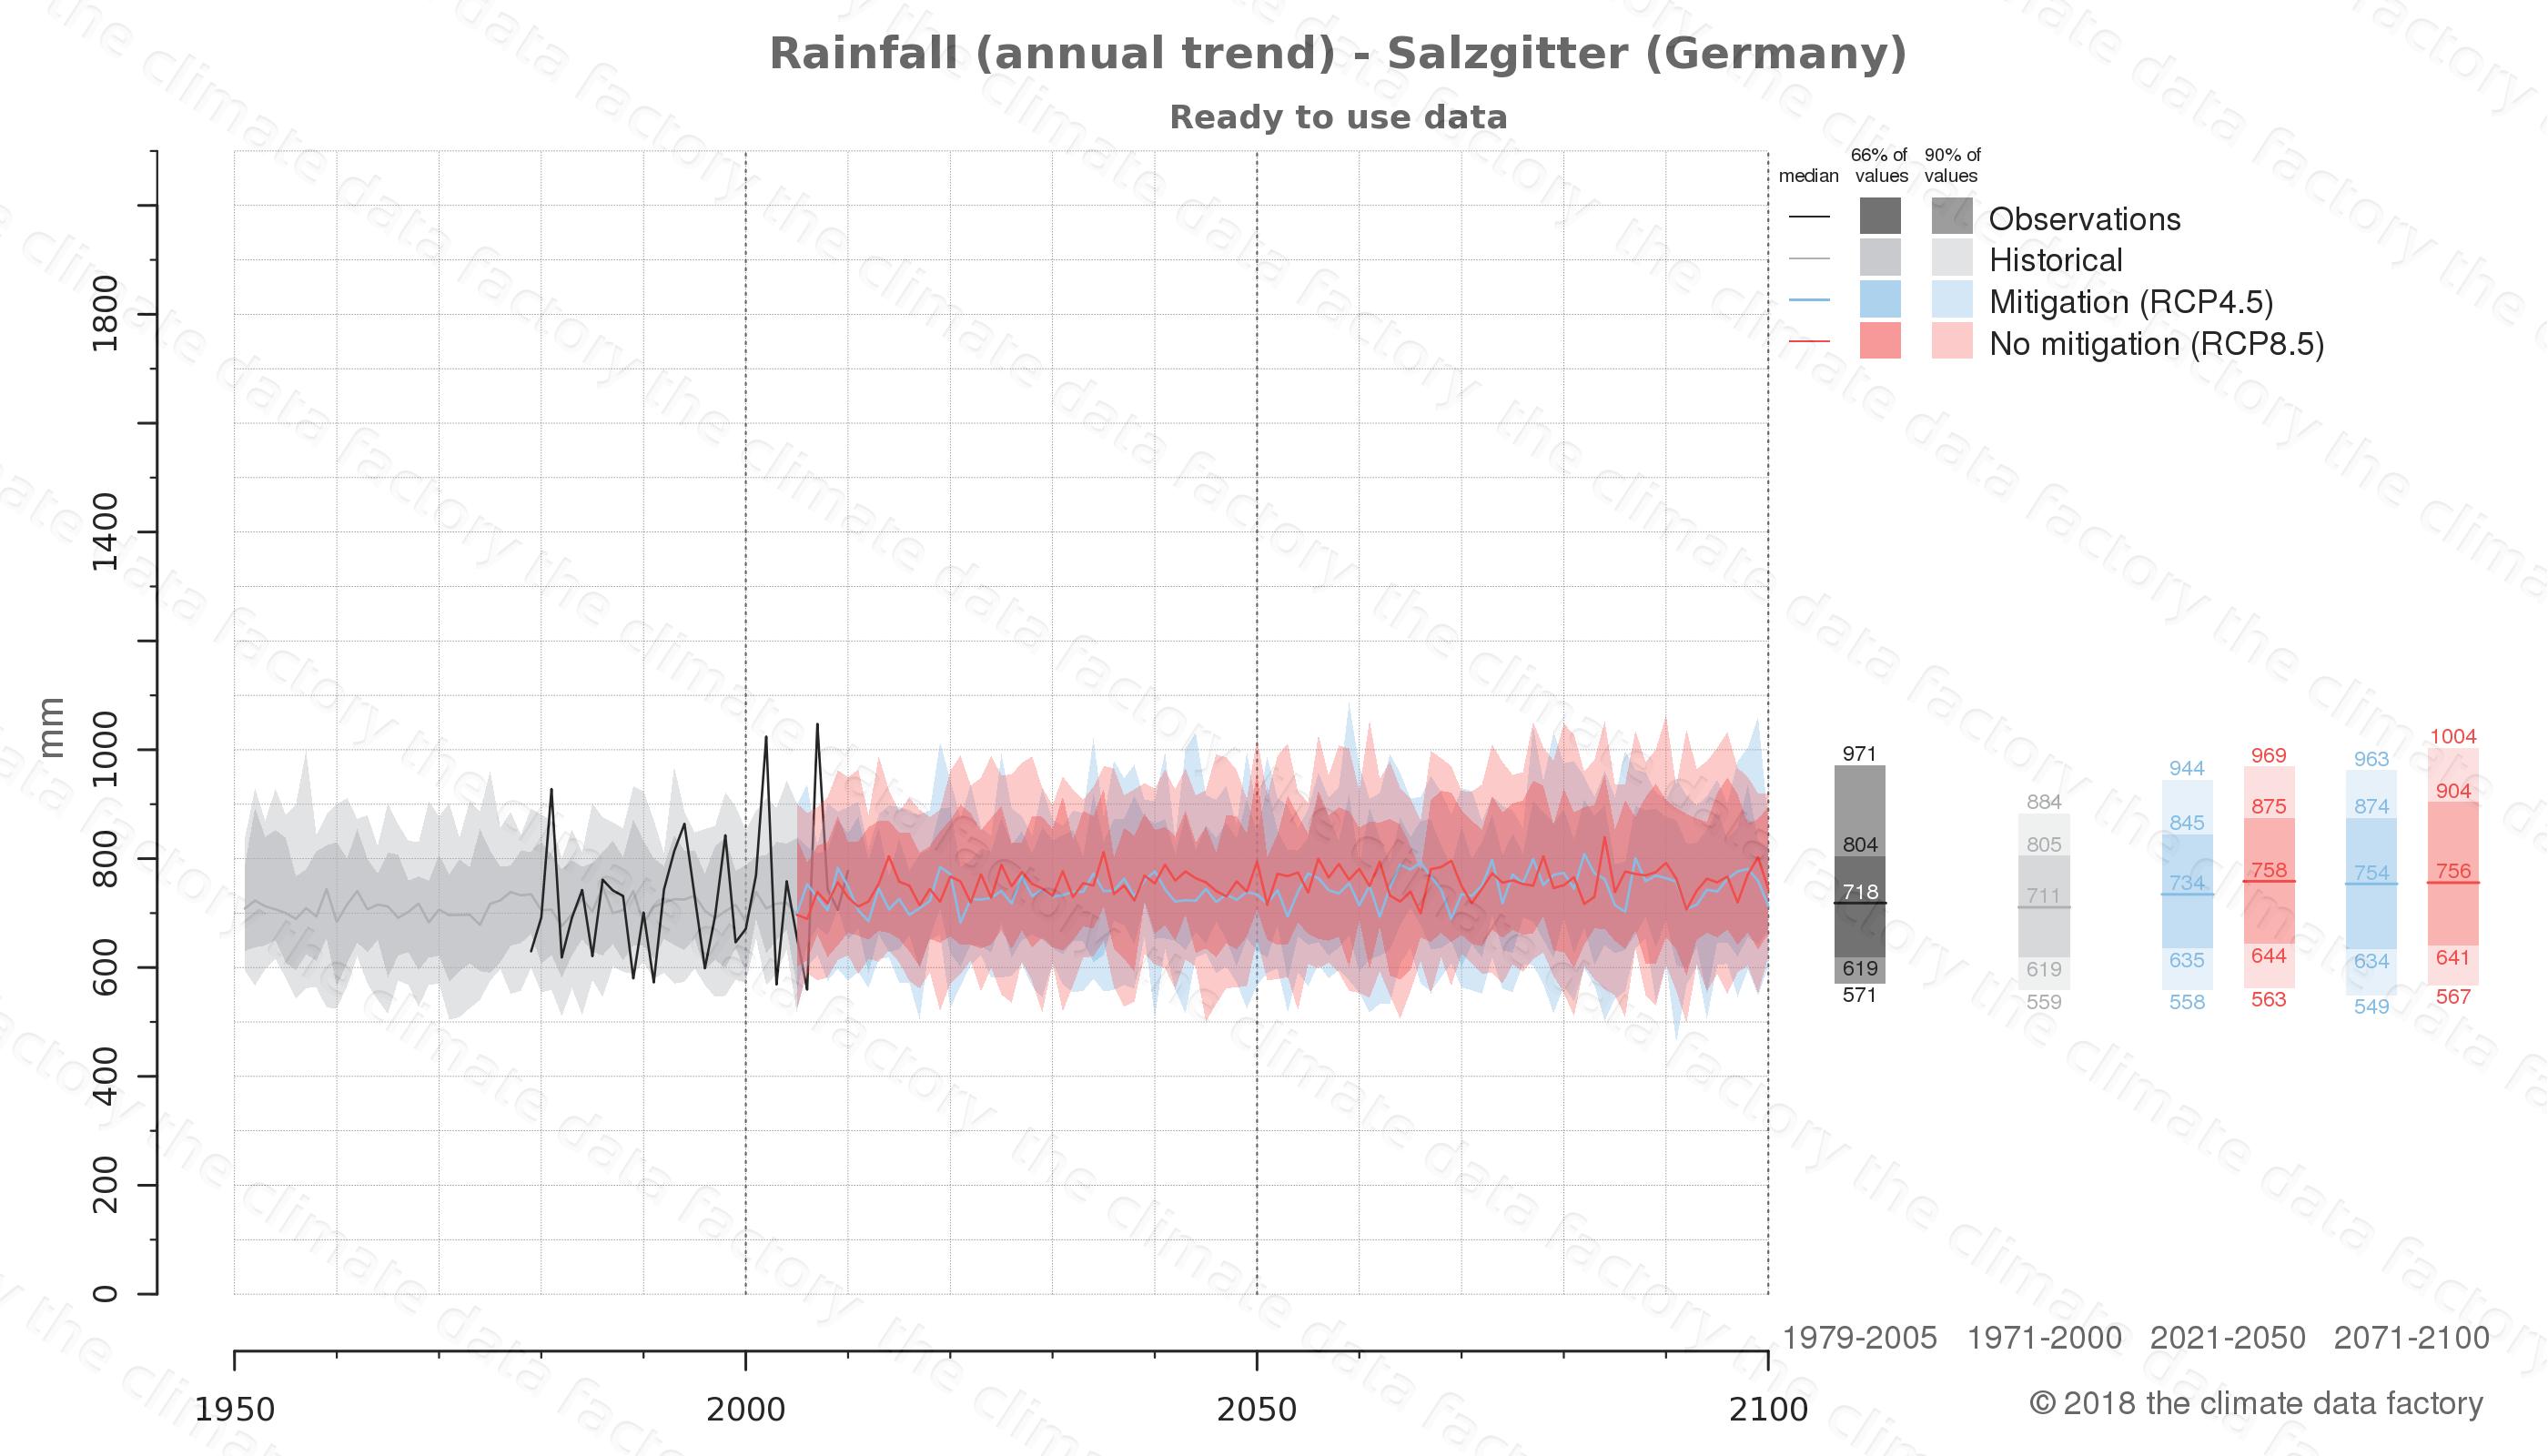 climate change data policy adaptation climate graph city data rainfall salzgitter germany